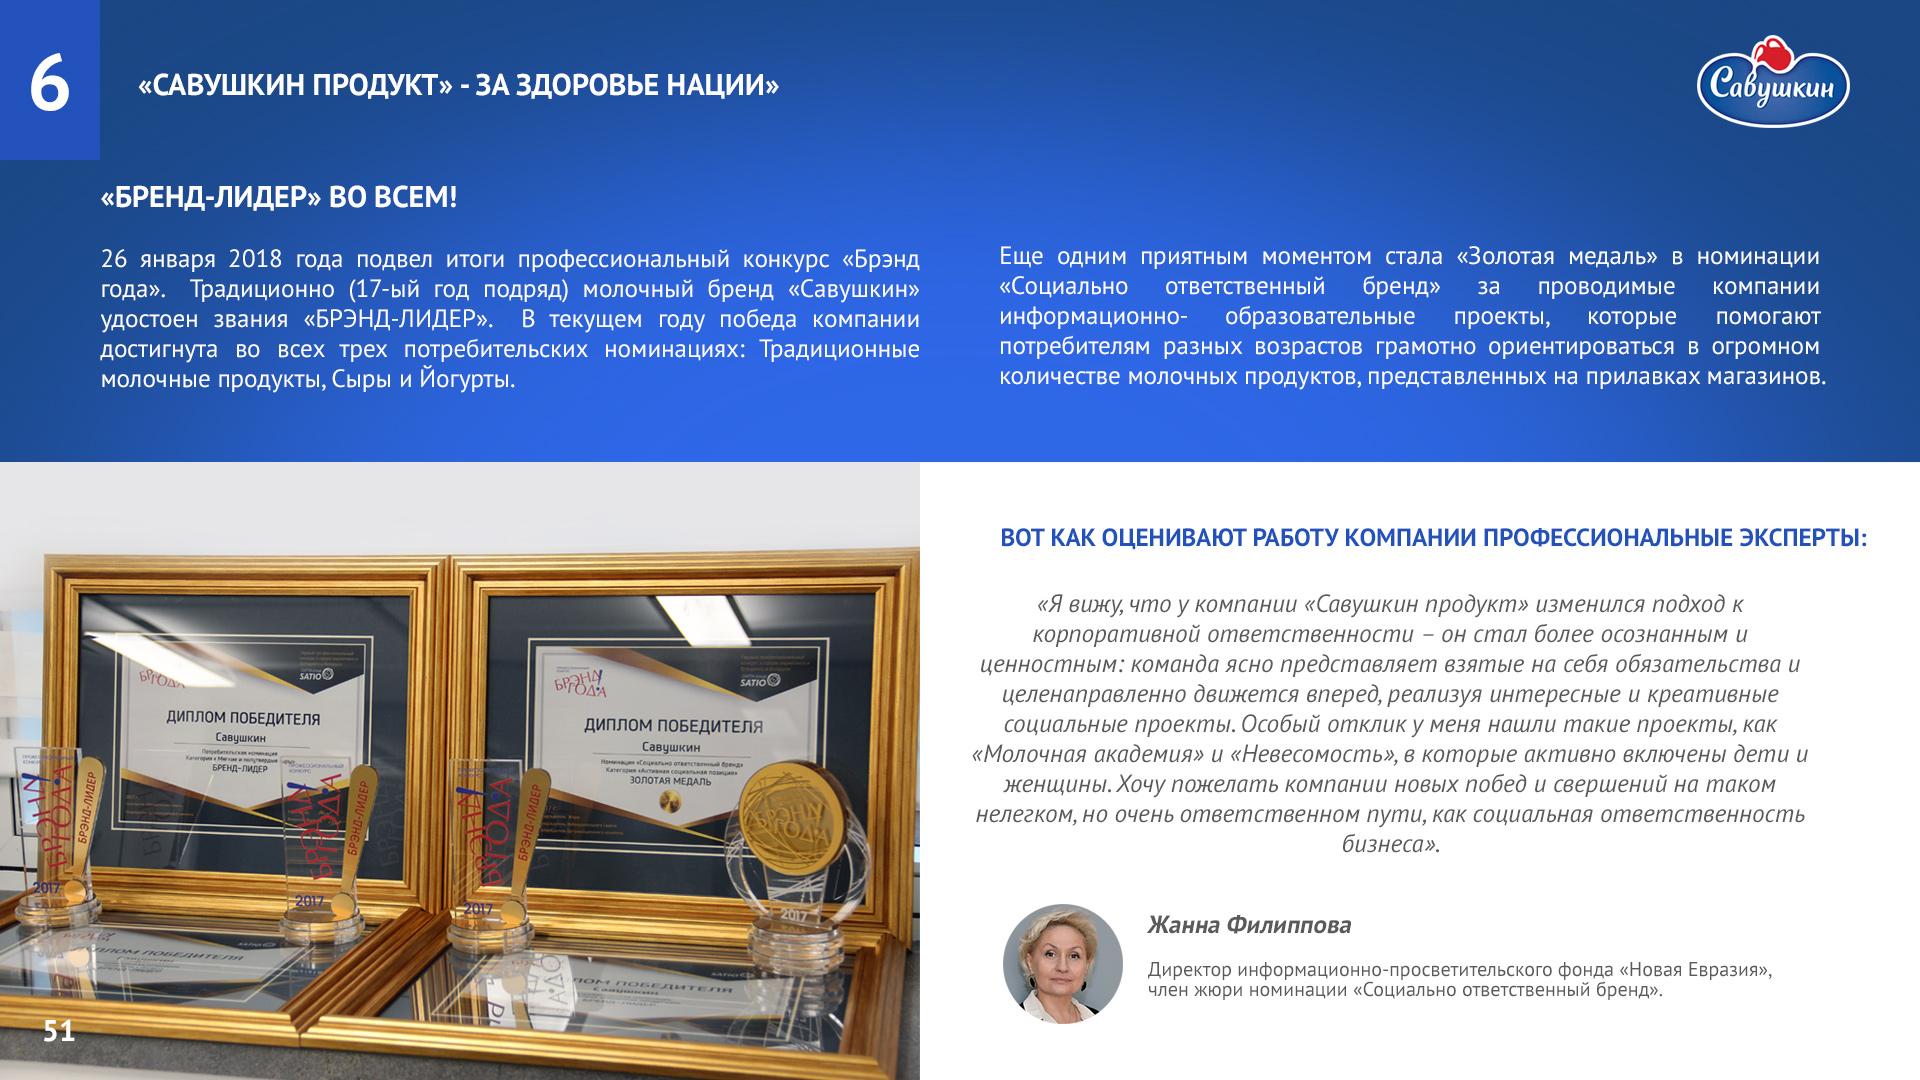 Savushkin_product_report-18